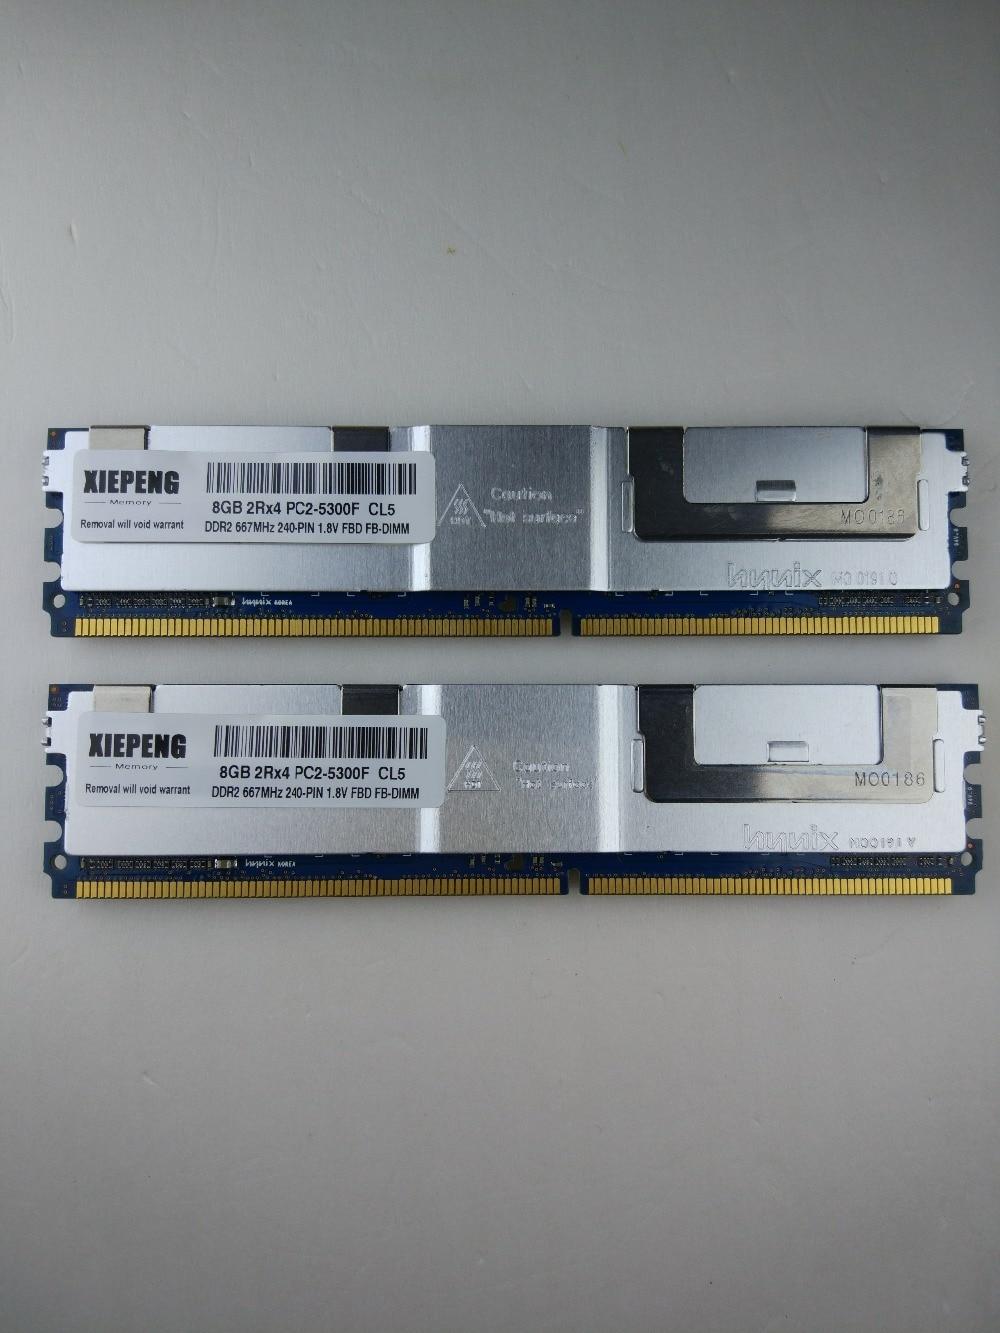 ذاكرة 16GB (2x8GB) DDR2 ECC FBD مخزنة بالكامل RAM 4GB 667MHz FB-DIMM 8G 2Rx4 PC2-5300F لديل PowerEdge من 1950 M600 M1000e